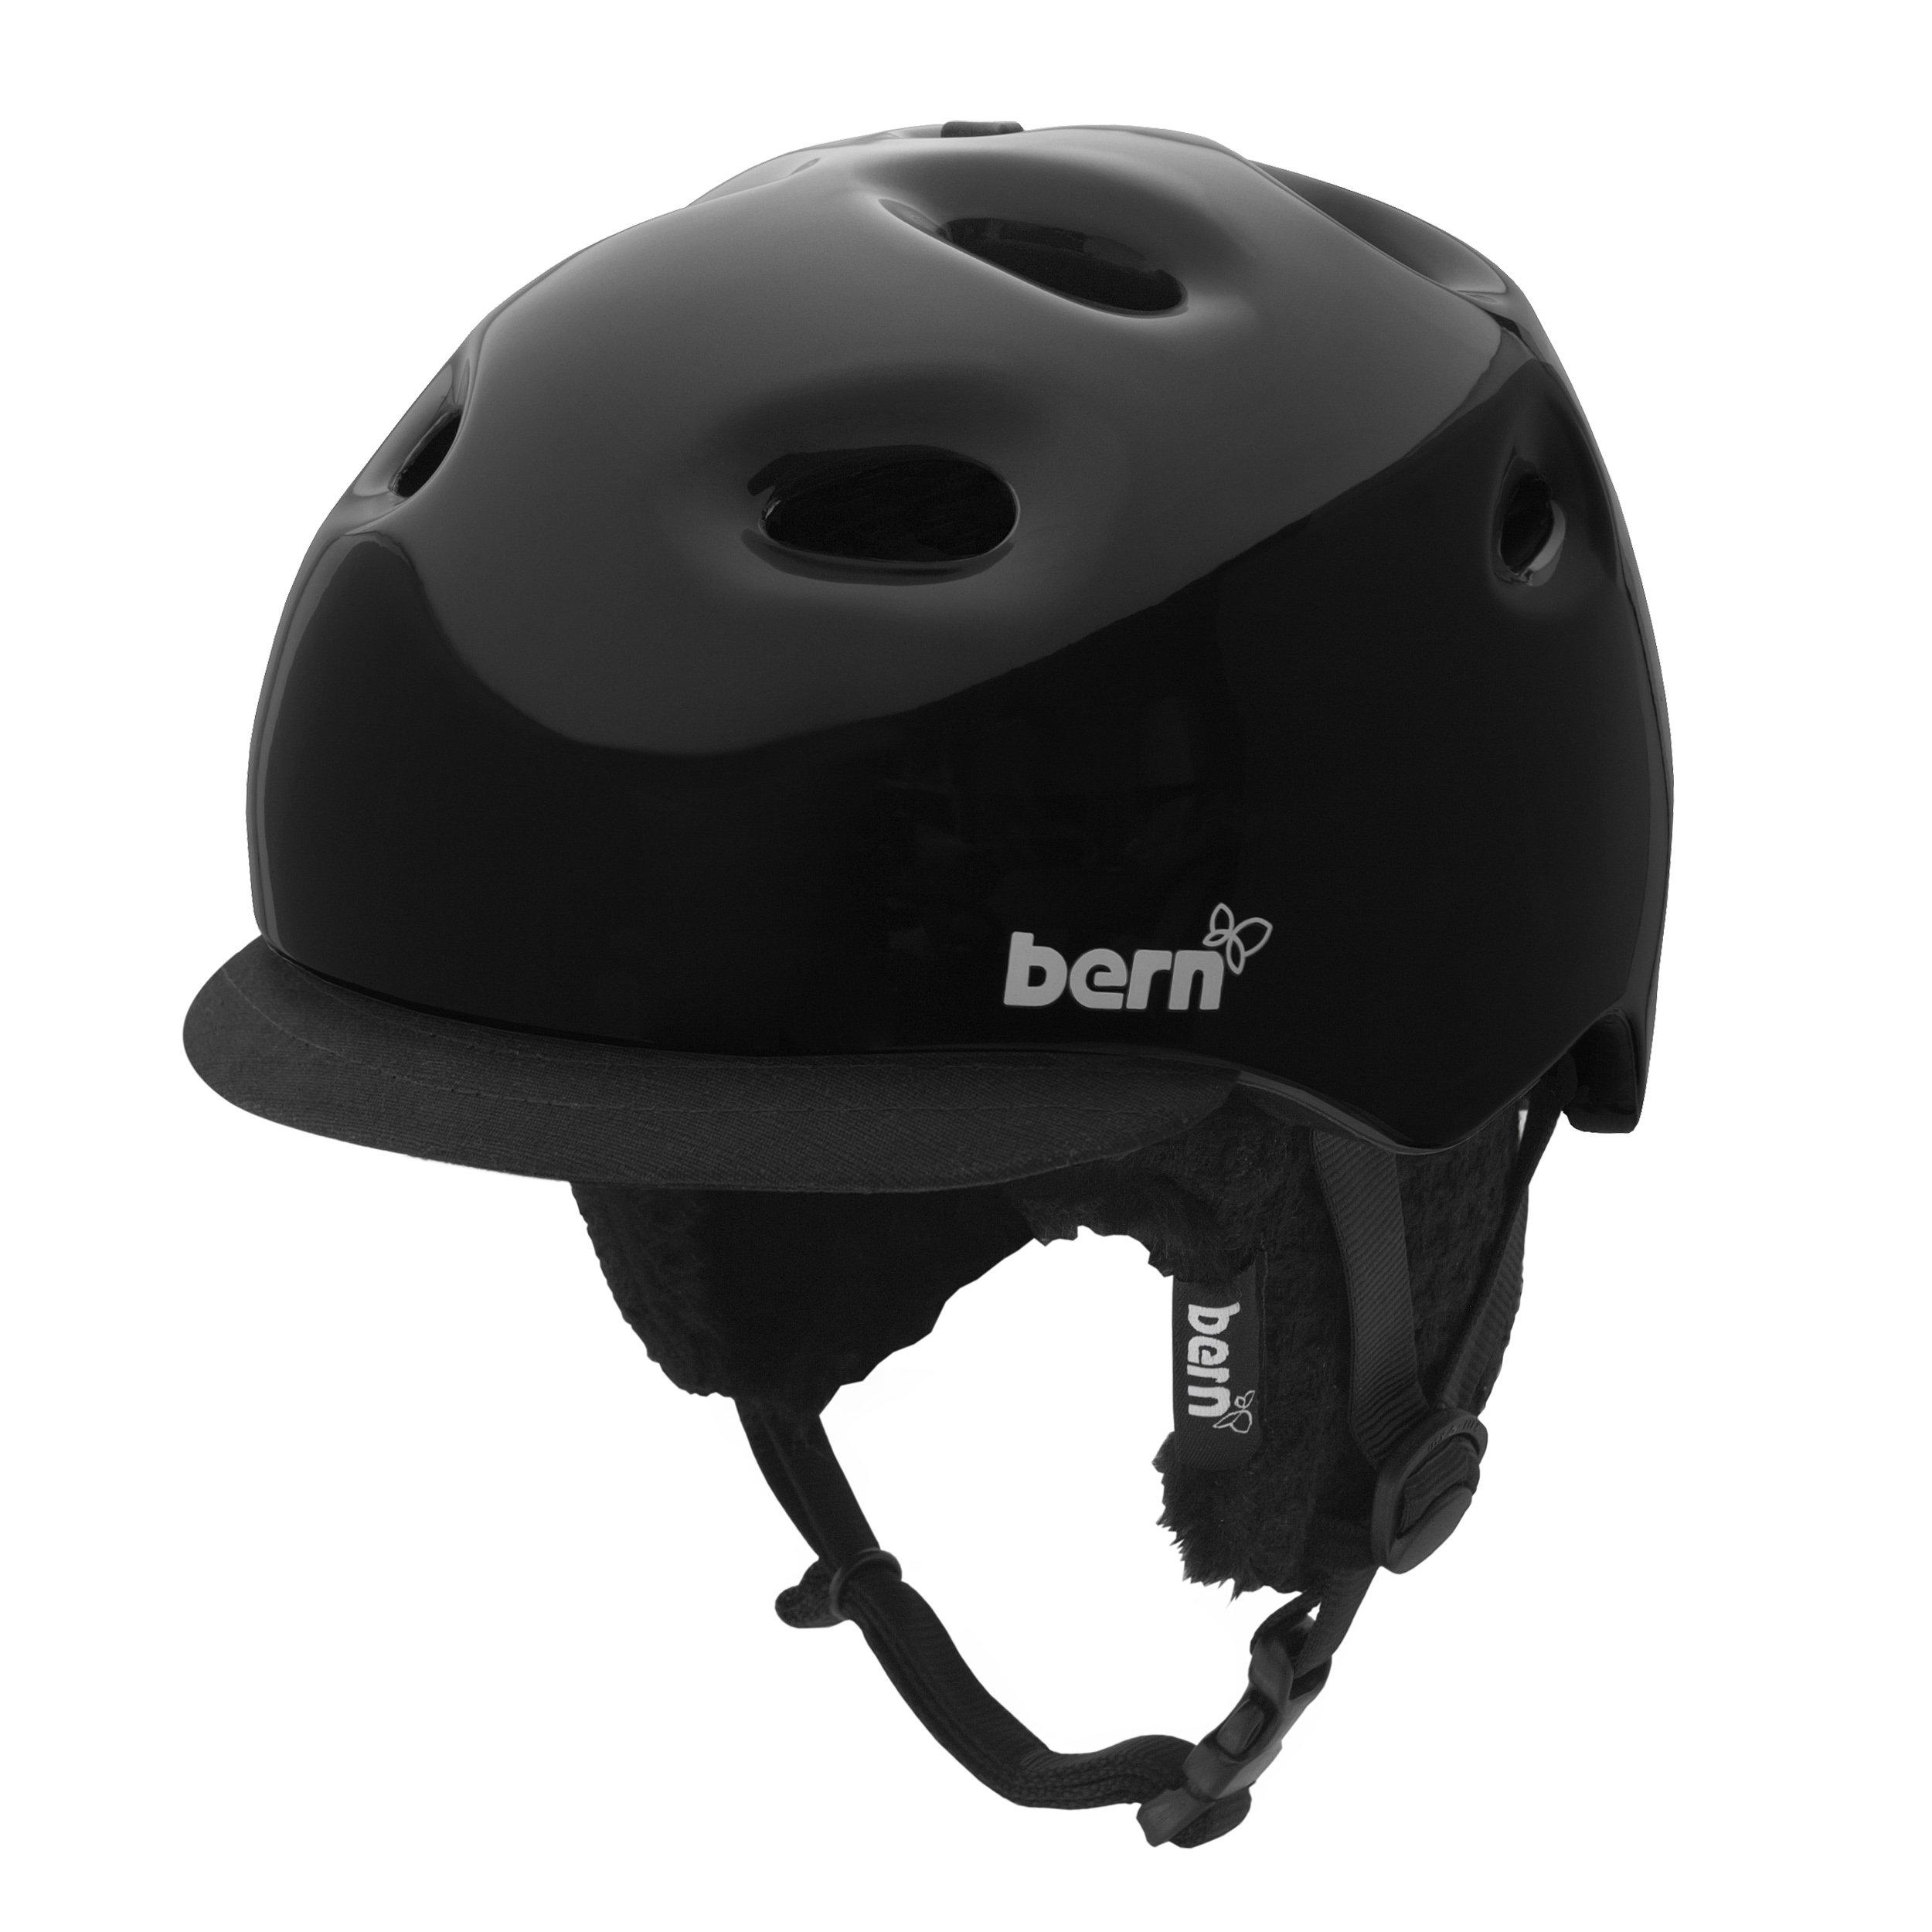 Bern Cougar 2 Tone Gloss Helmet with Black Knit (Black, Small/Medium)